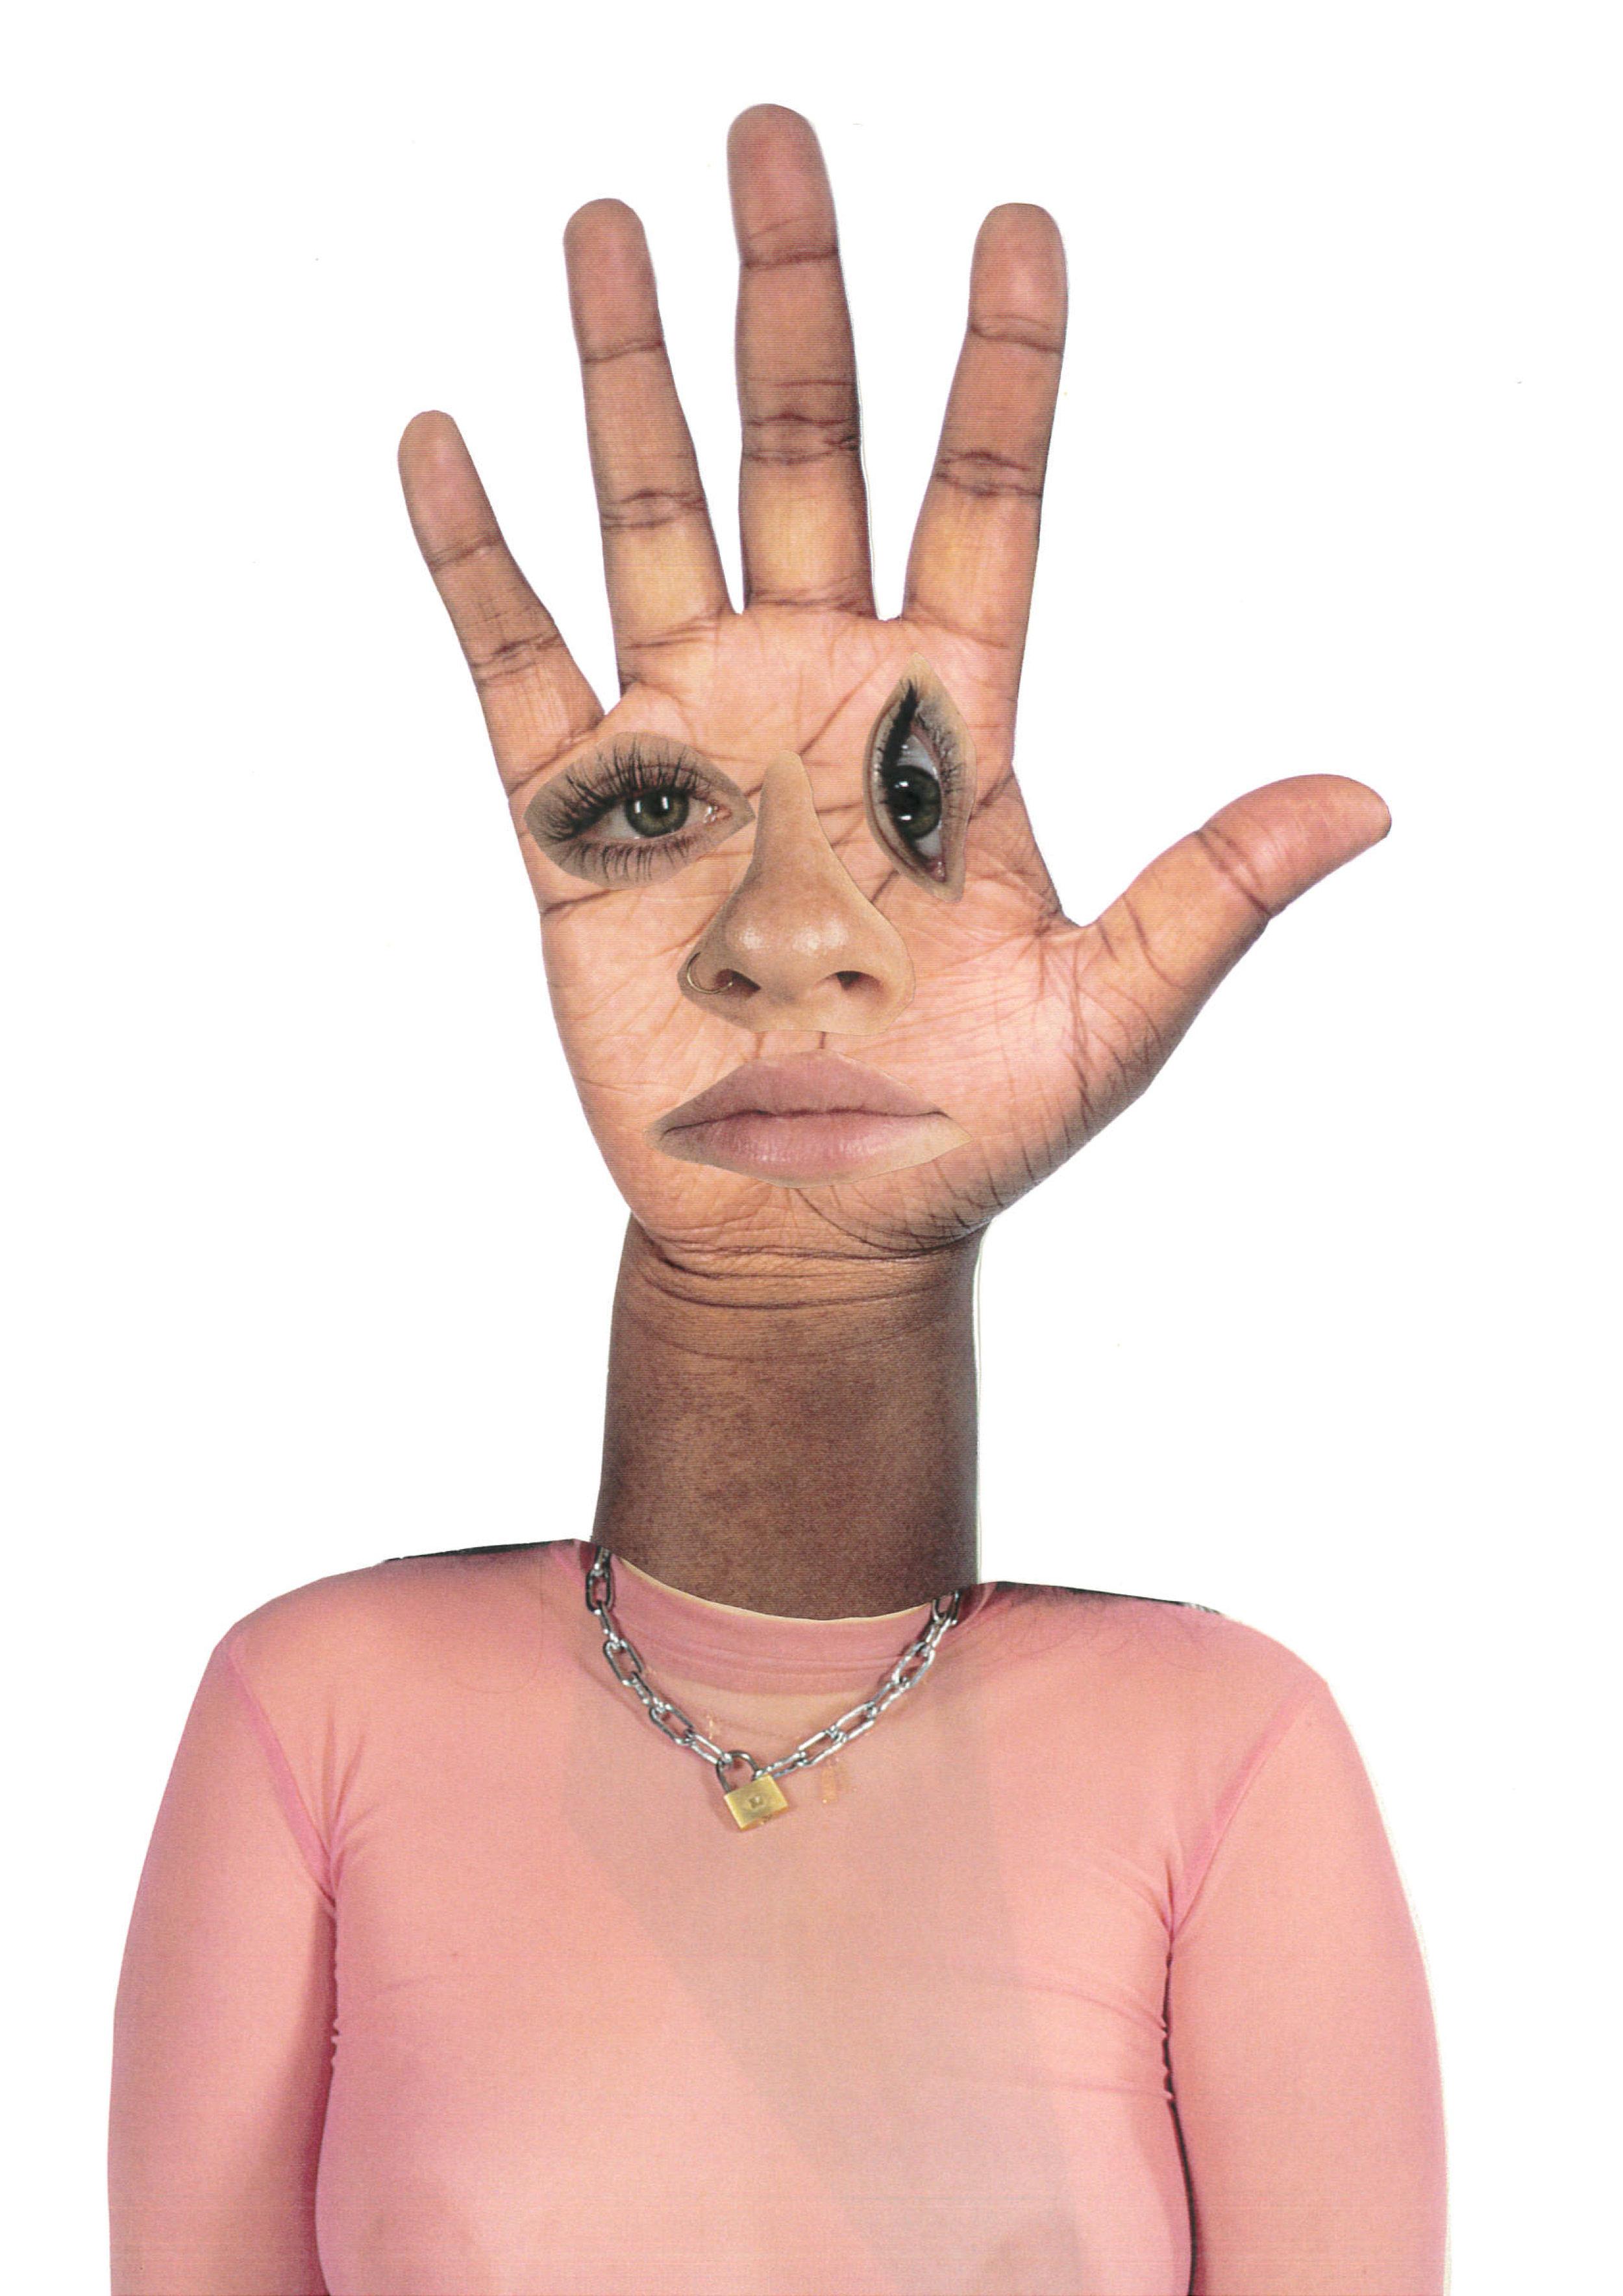 1handface.jpg